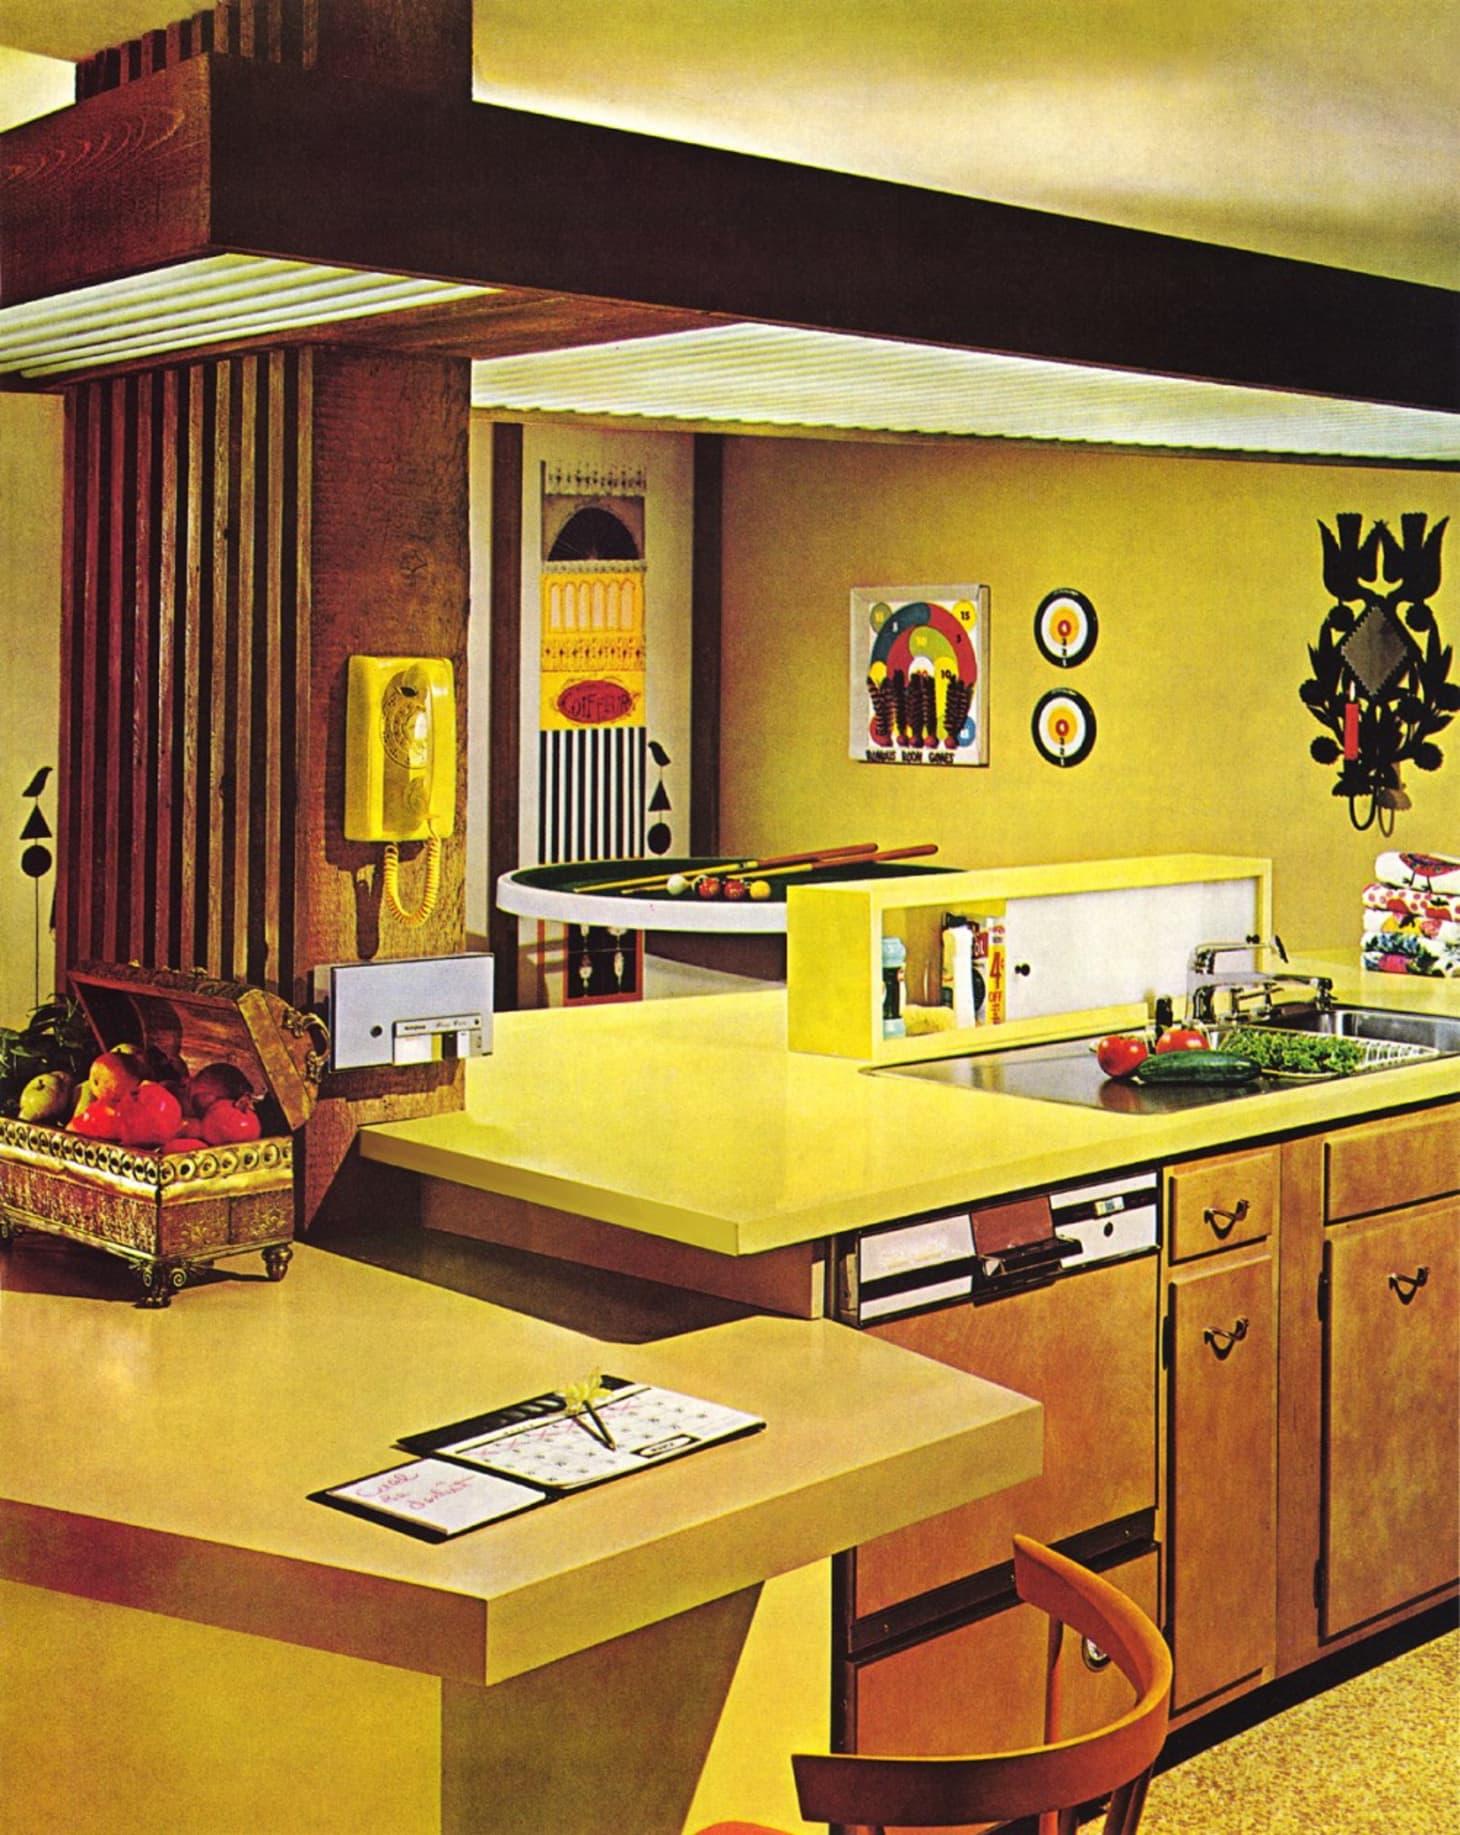 Interior Design For Kitchen: A Brief History Of 1970s Kitchen Design